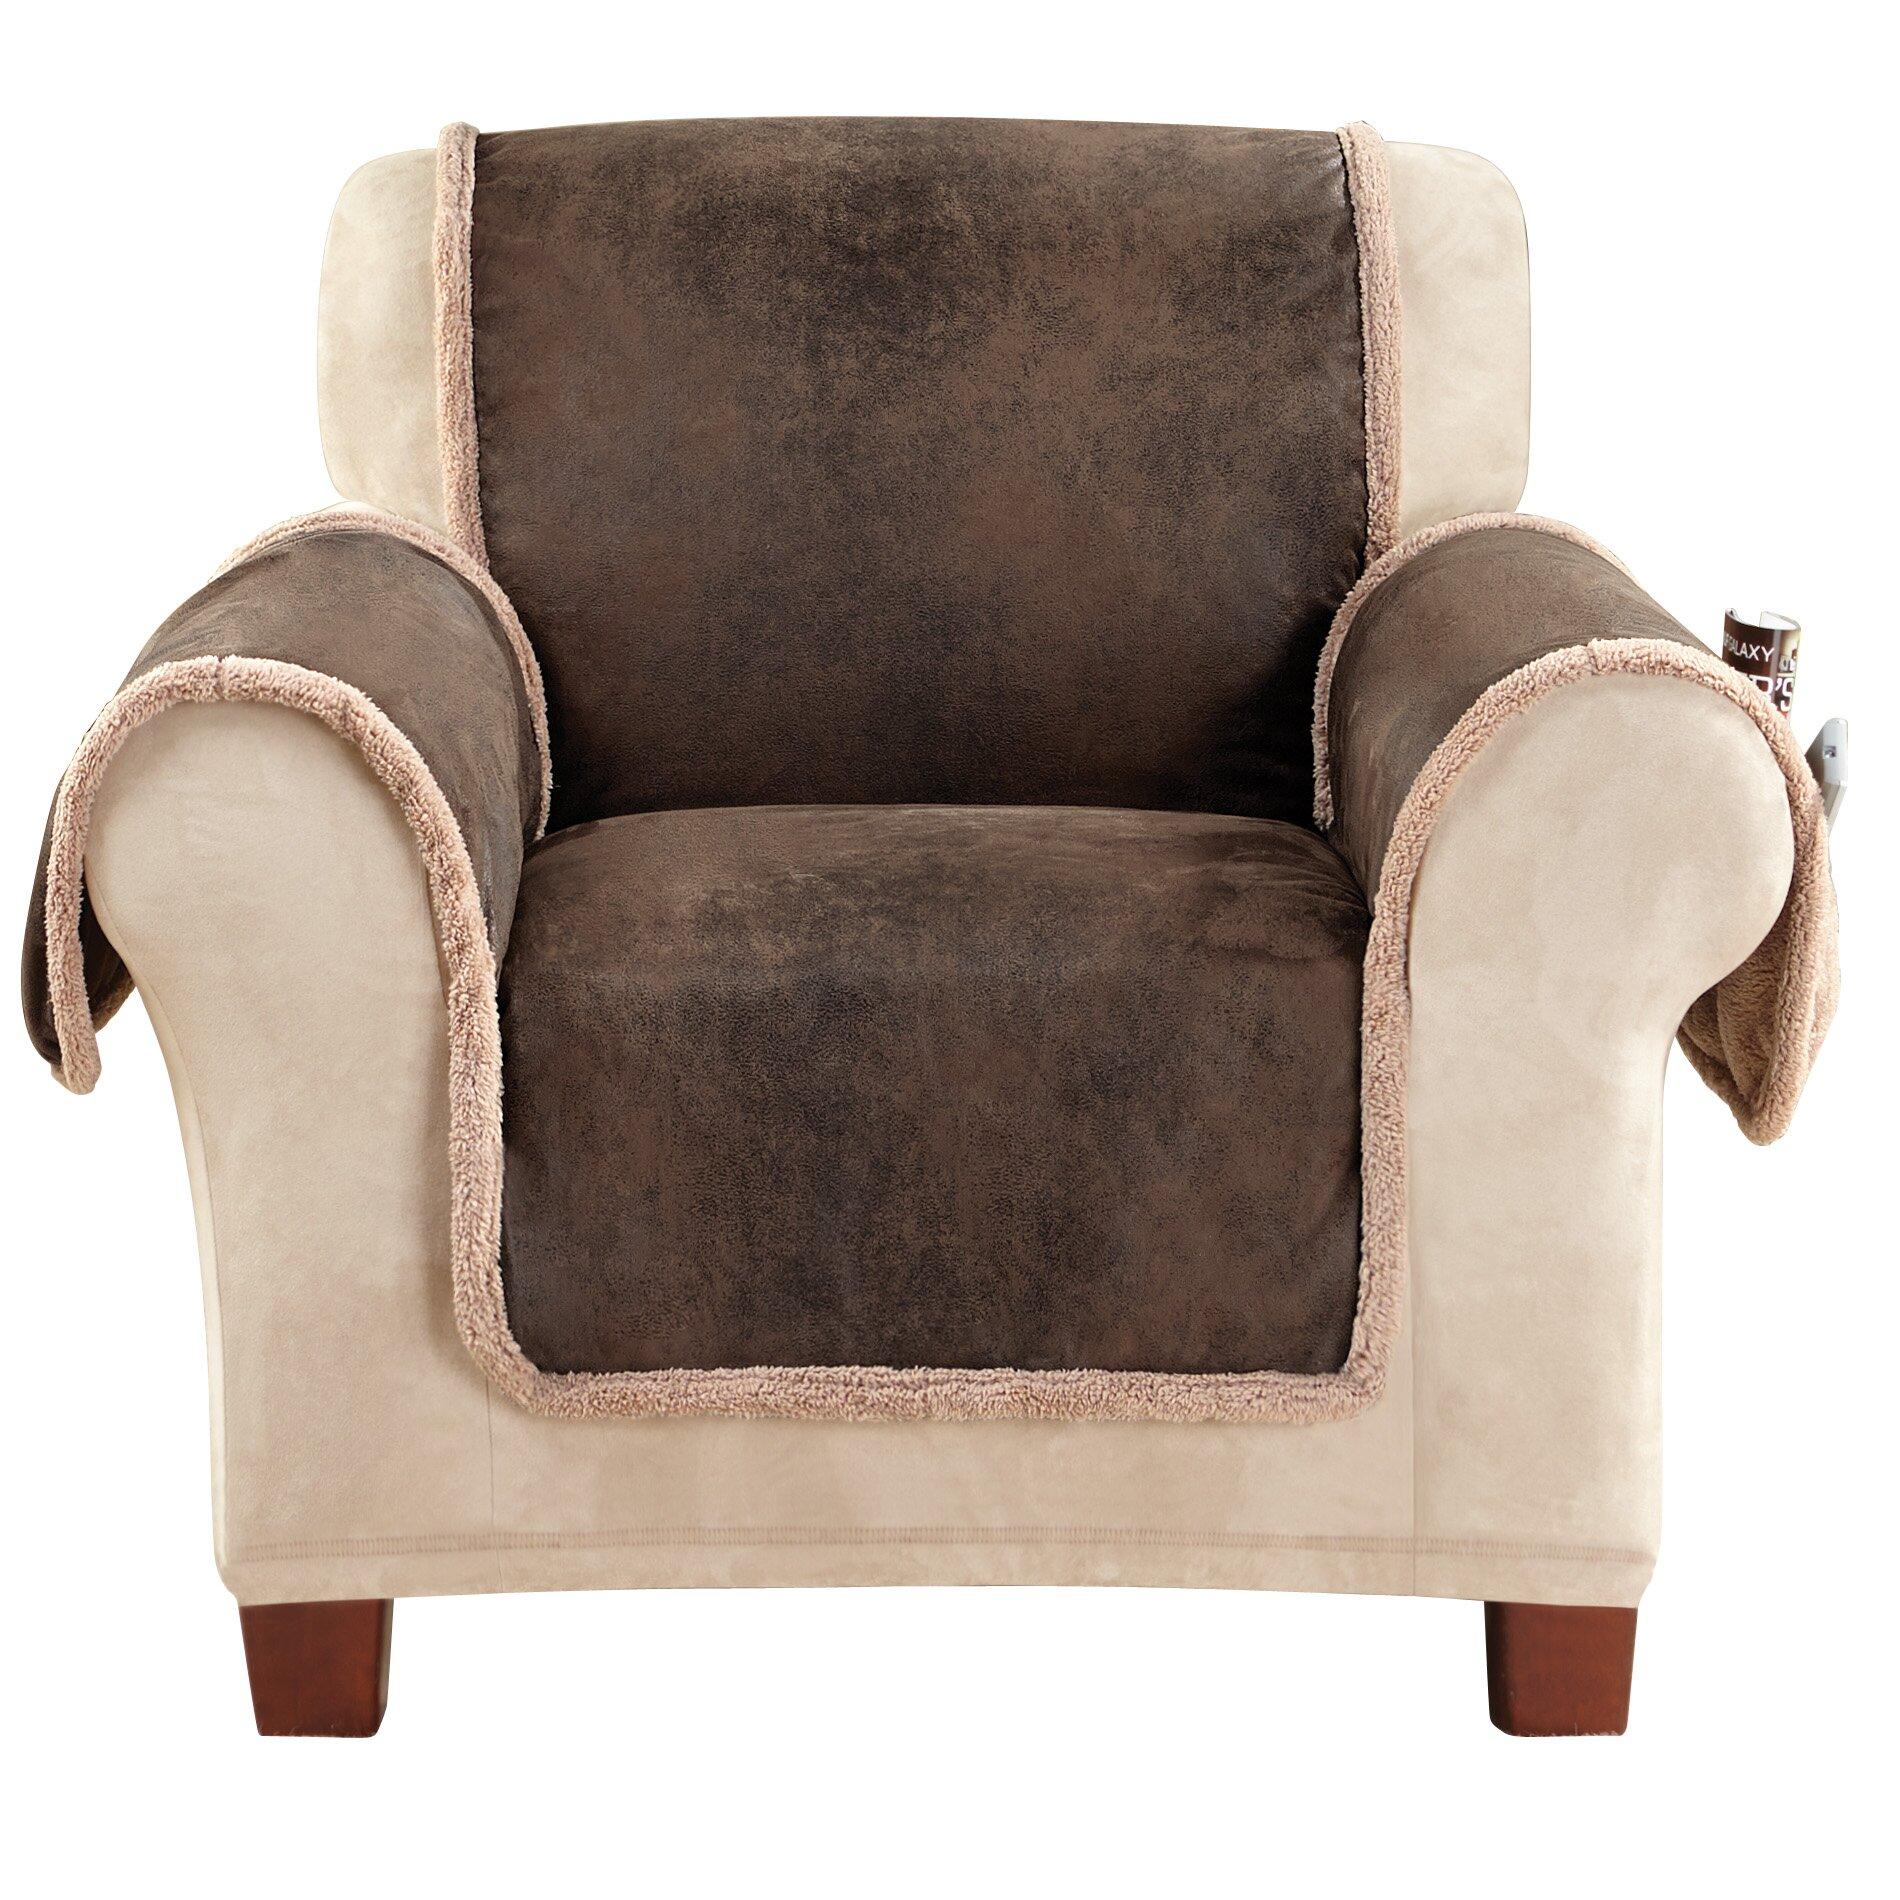 Sure Fit Vintage Armchair Slipcover Amp Reviews Wayfair